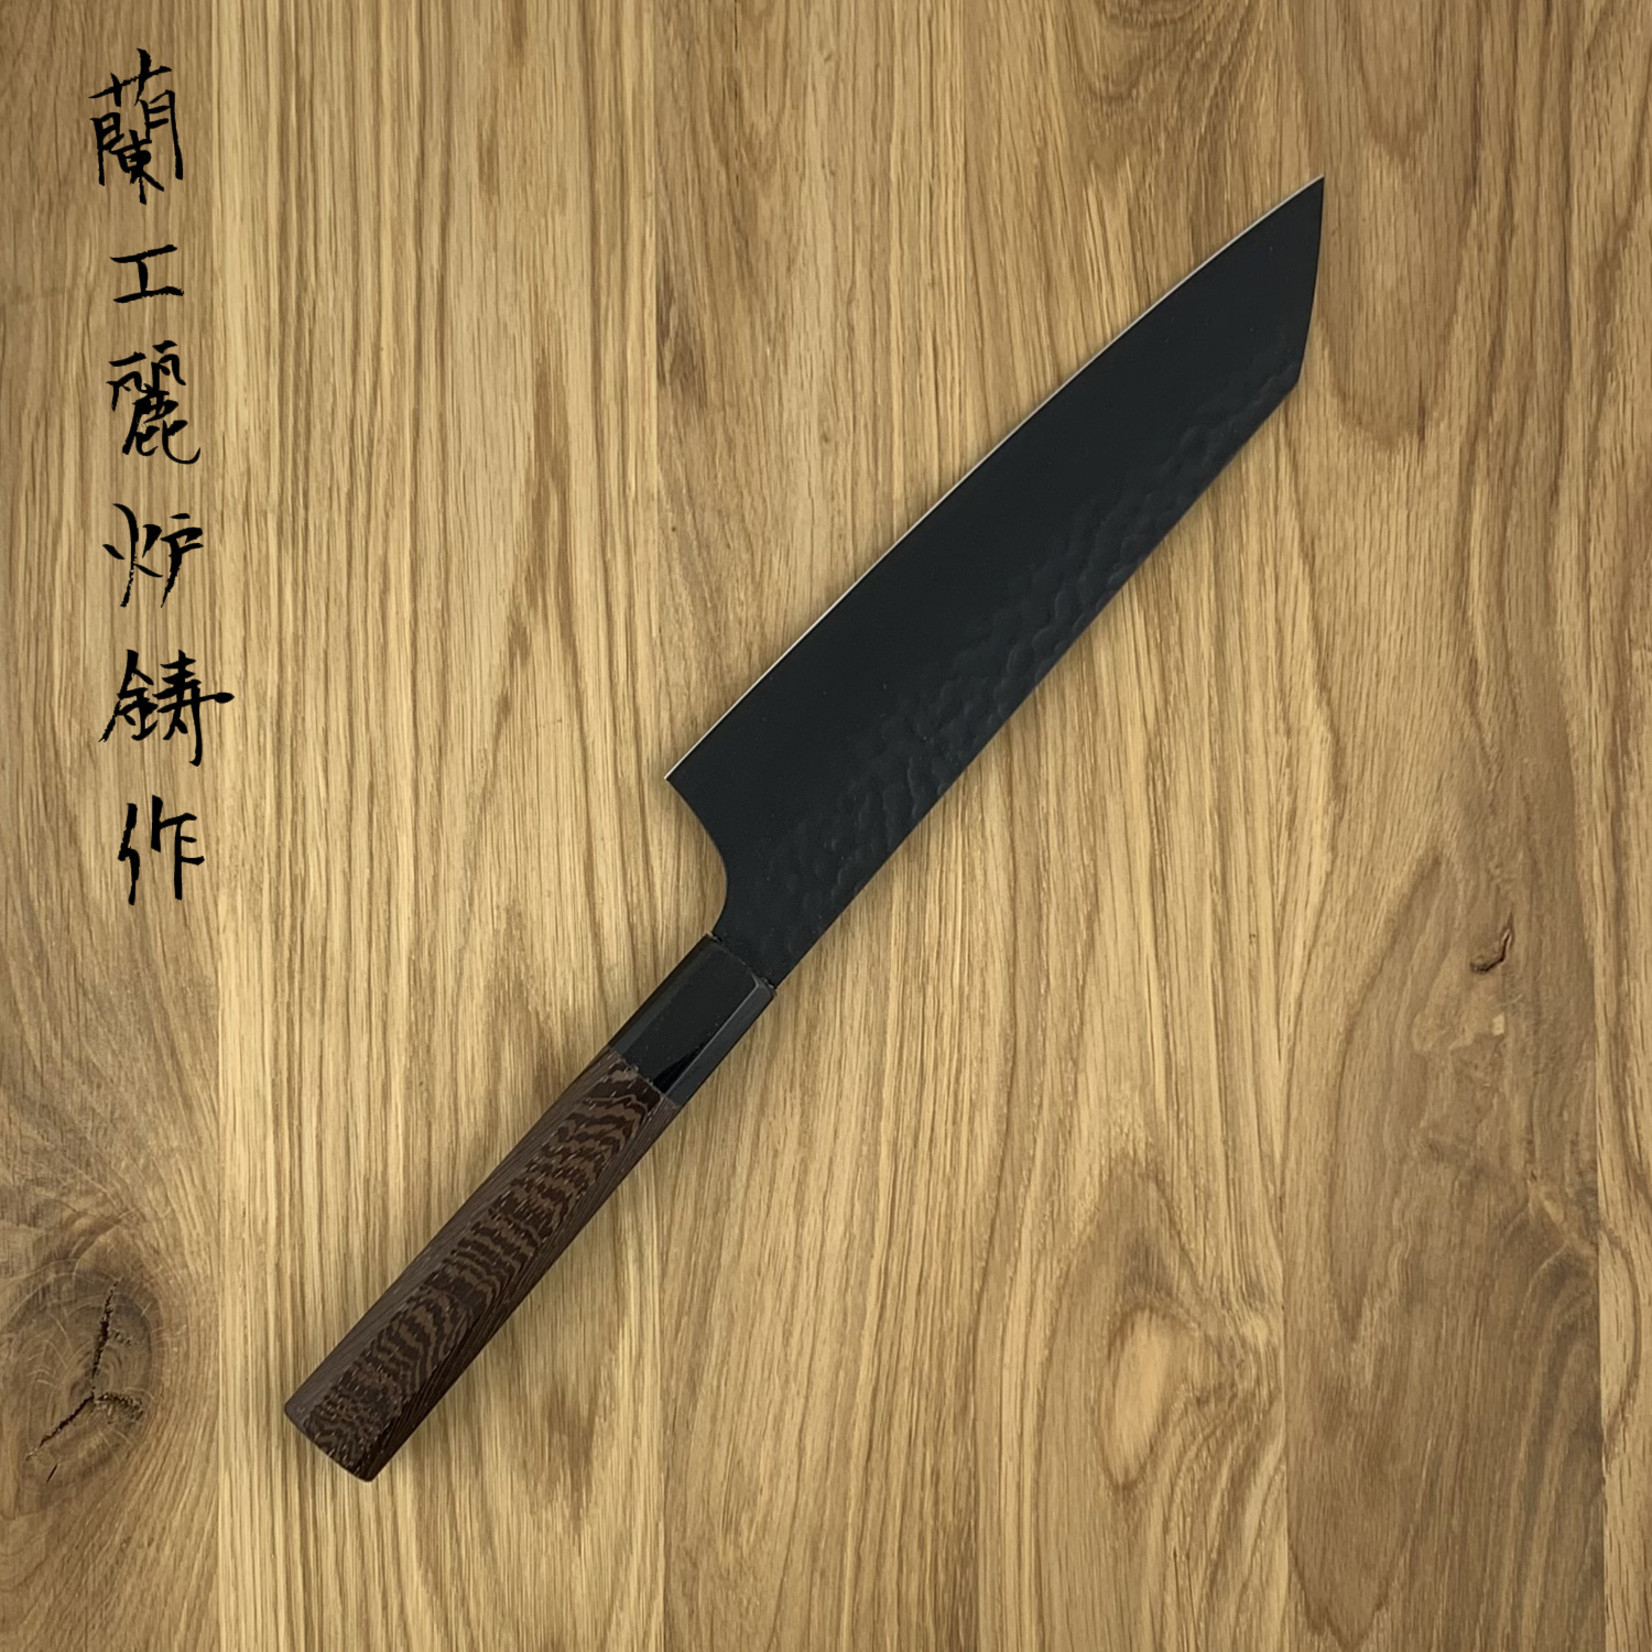 SAKAI TAKAYUKI Kurokage Kengata 190 mm 07494